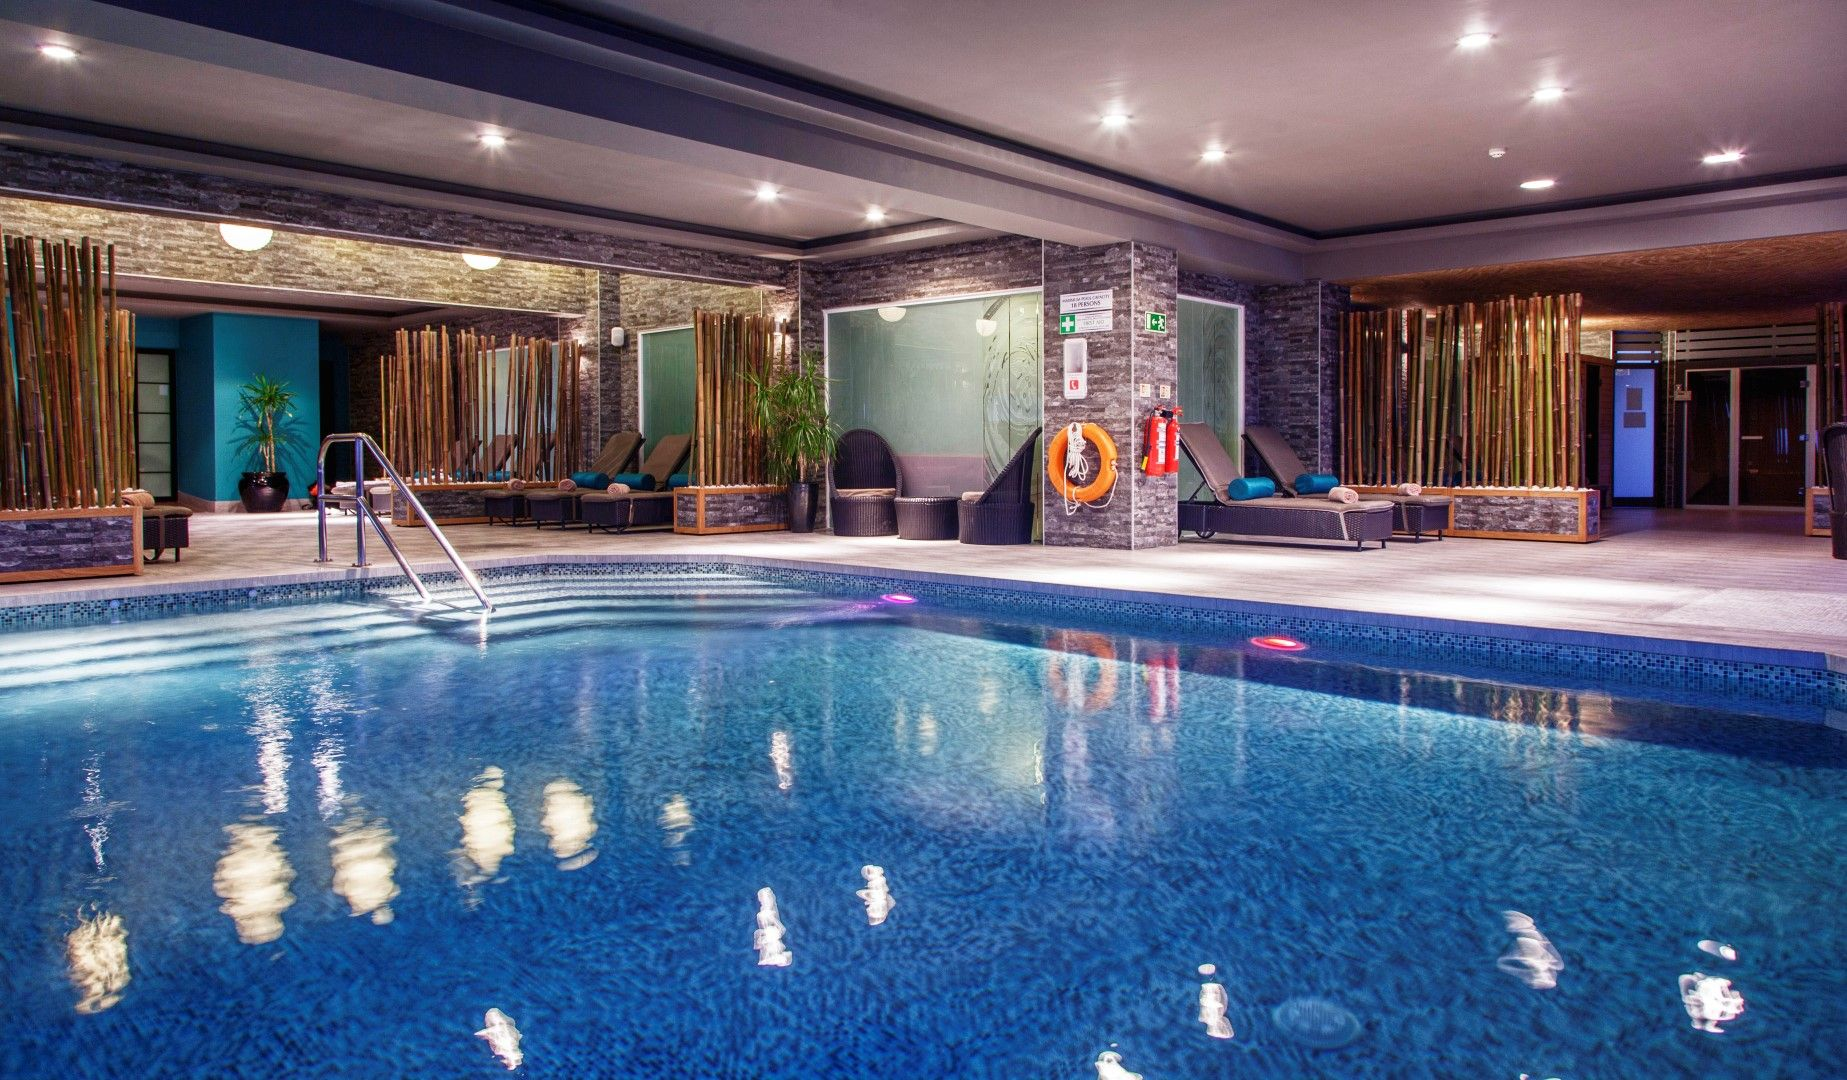 Indoor Swimming Pool Swimmingpool Indoorswimmingpool